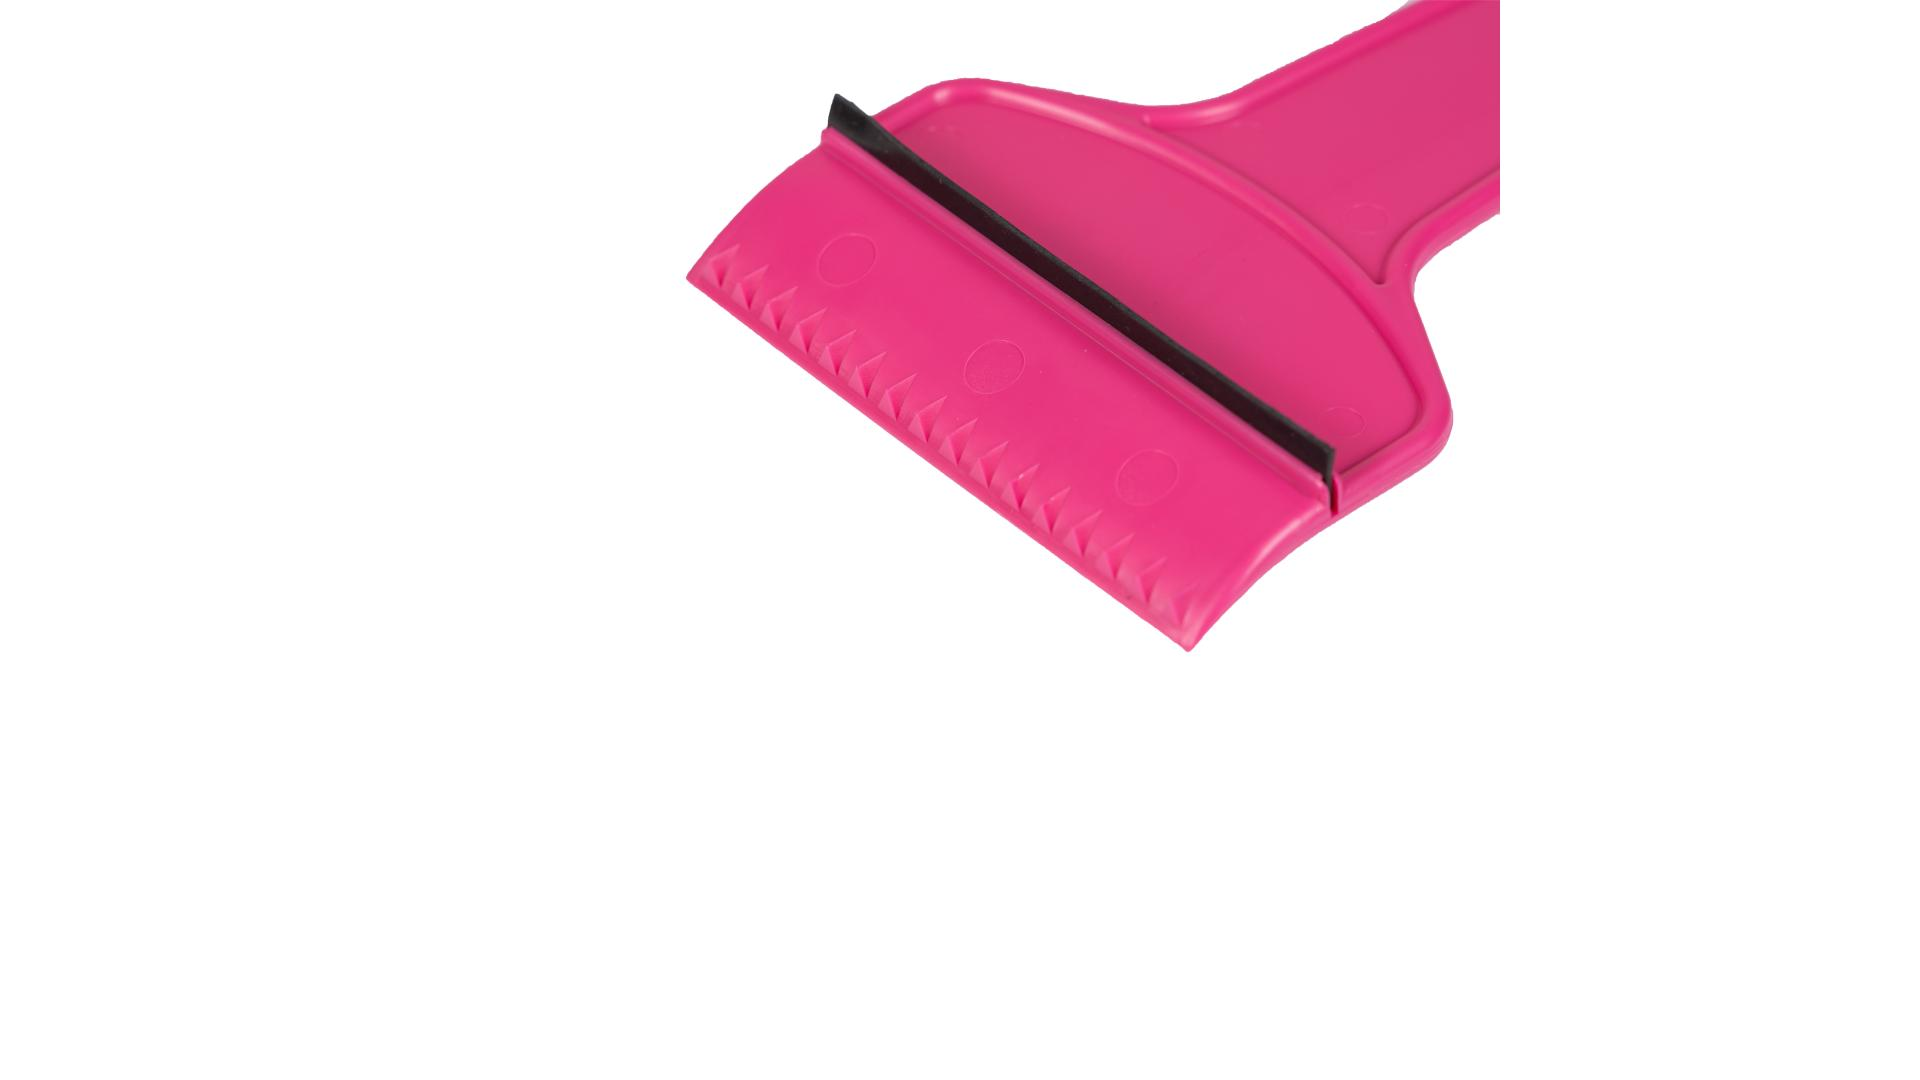 Škrabka s gumou MIX barev